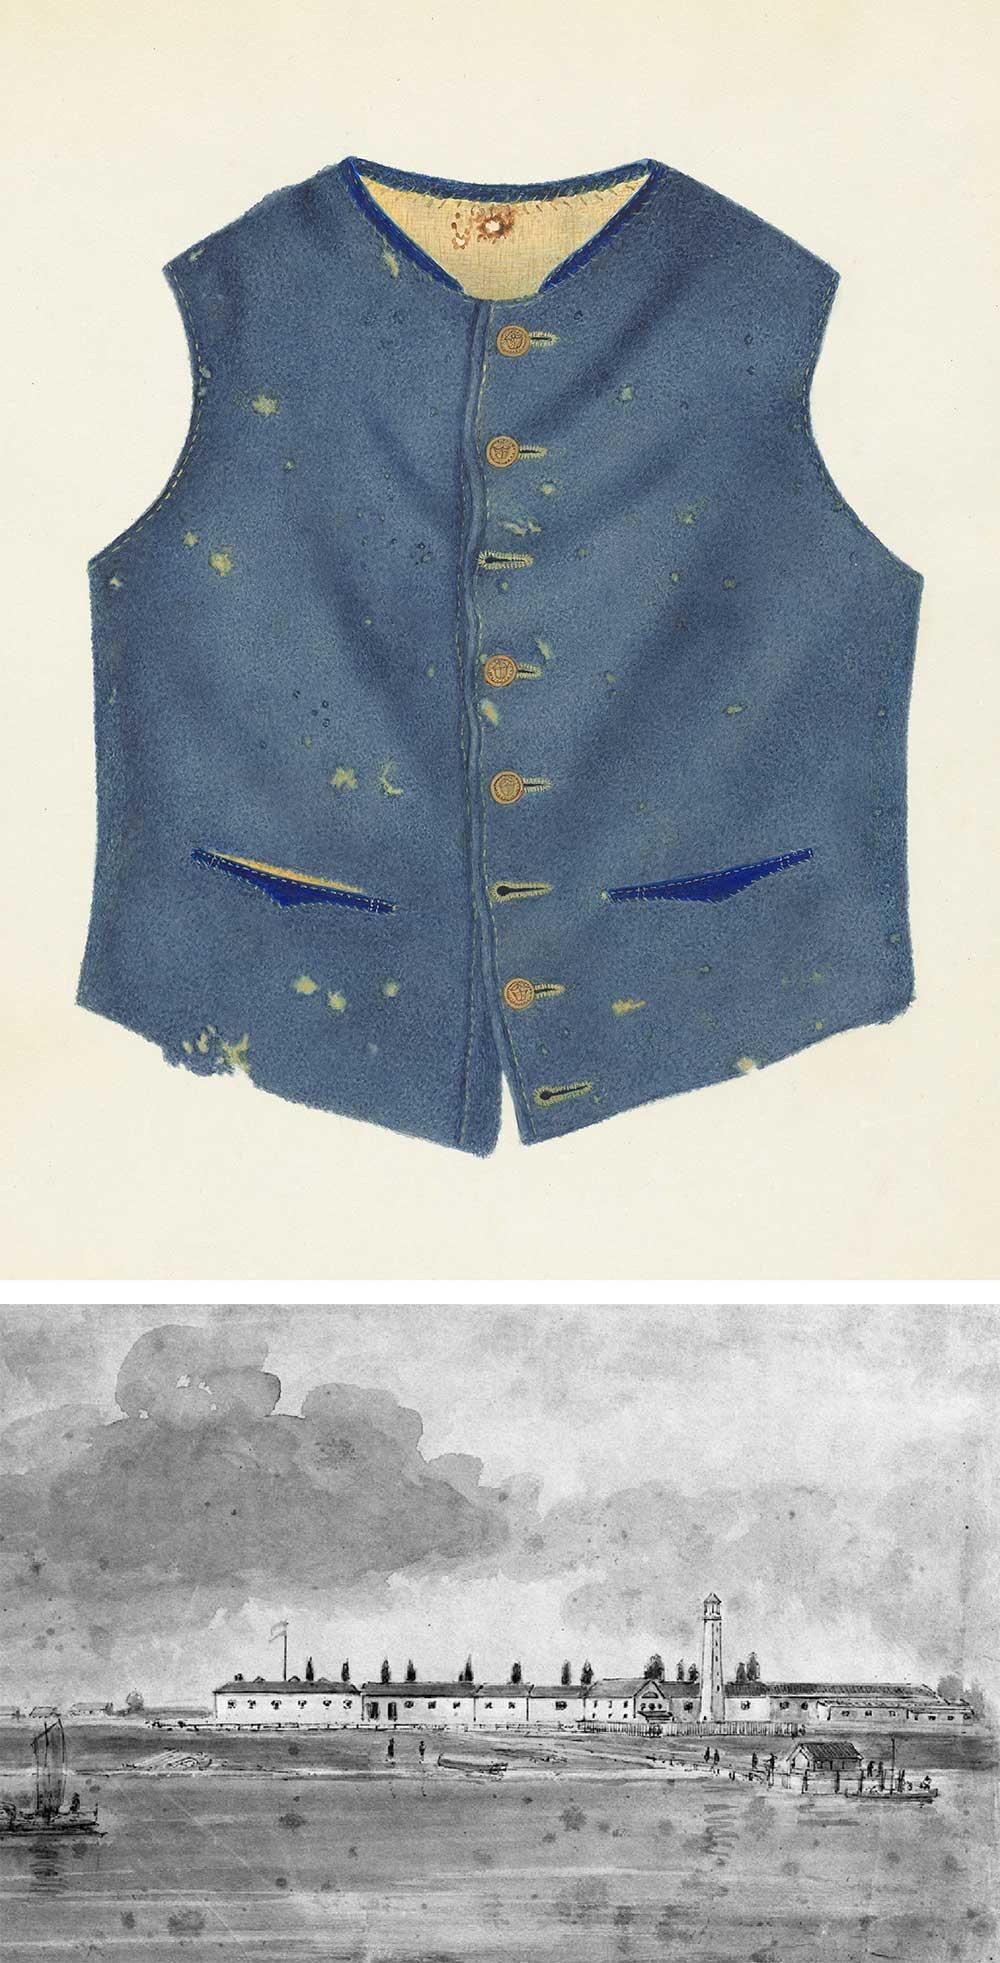 Top: Confederate Uniform, by Annie B. Johnston, c. 1938. Bottom: Fort Monroe, Virginia, 1860.